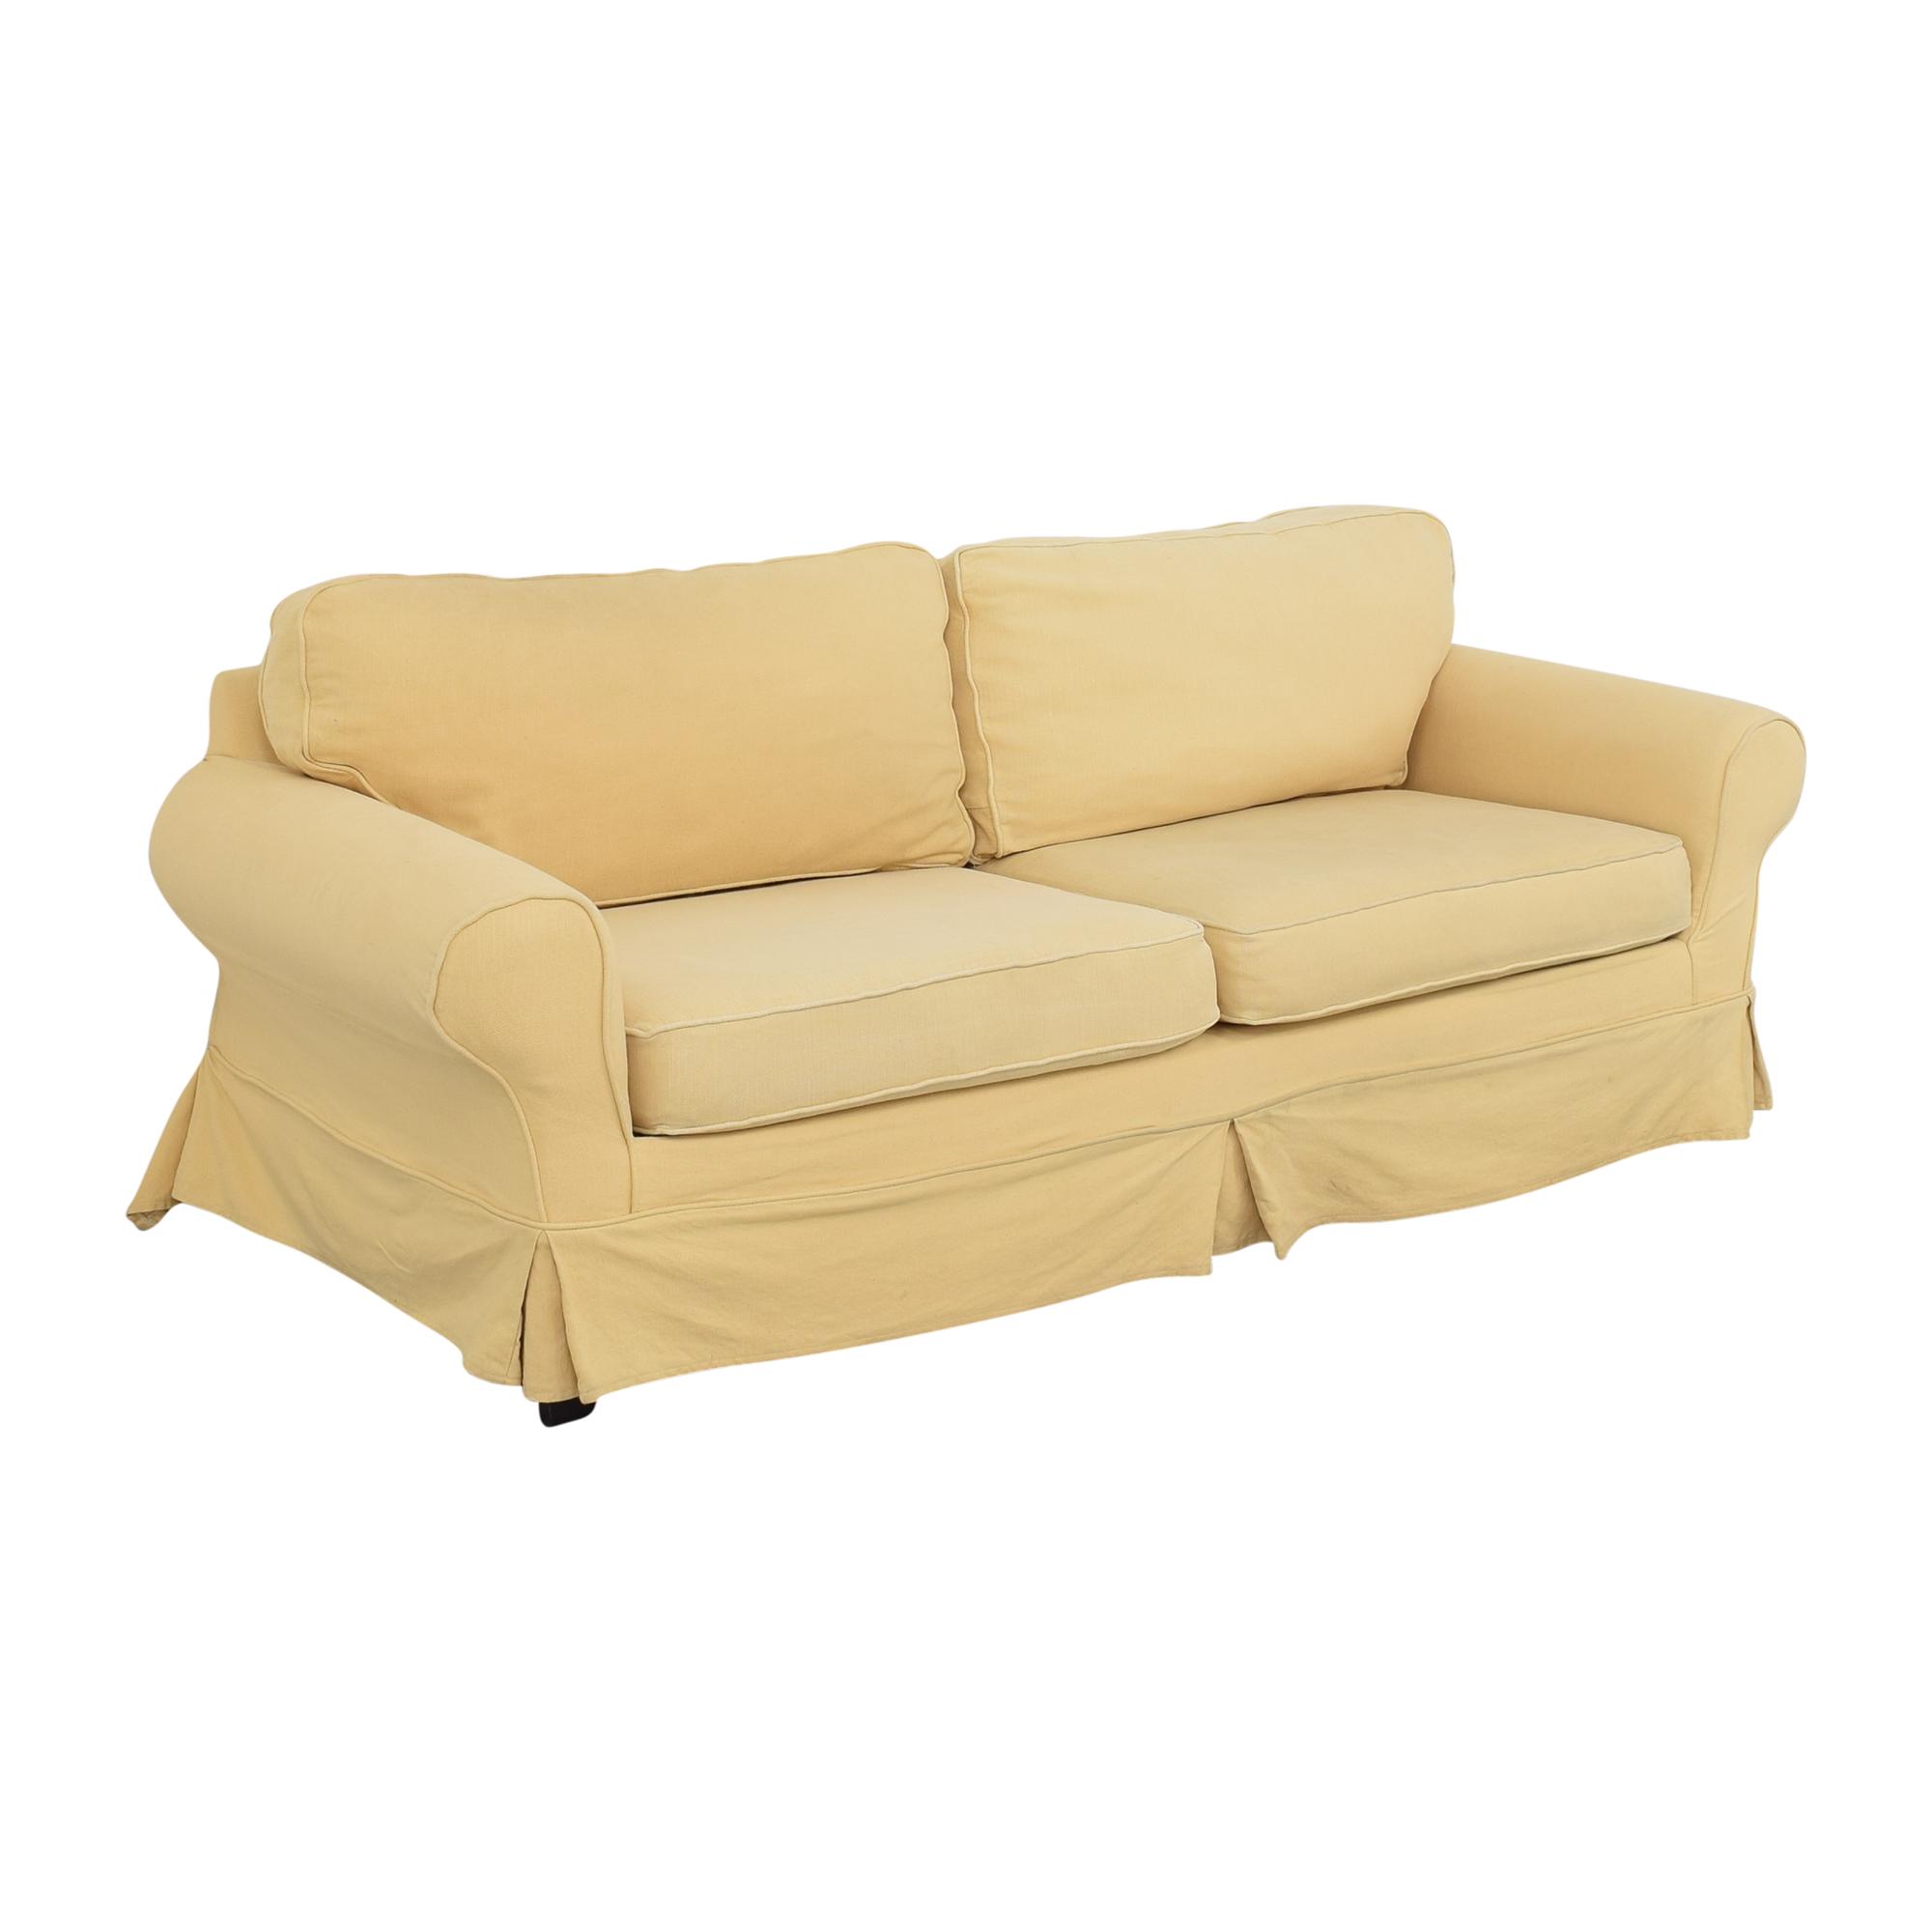 Mitchell Gold + Bob Williams Mitchell Gold + Bob Williams Alexa Sofa for sale